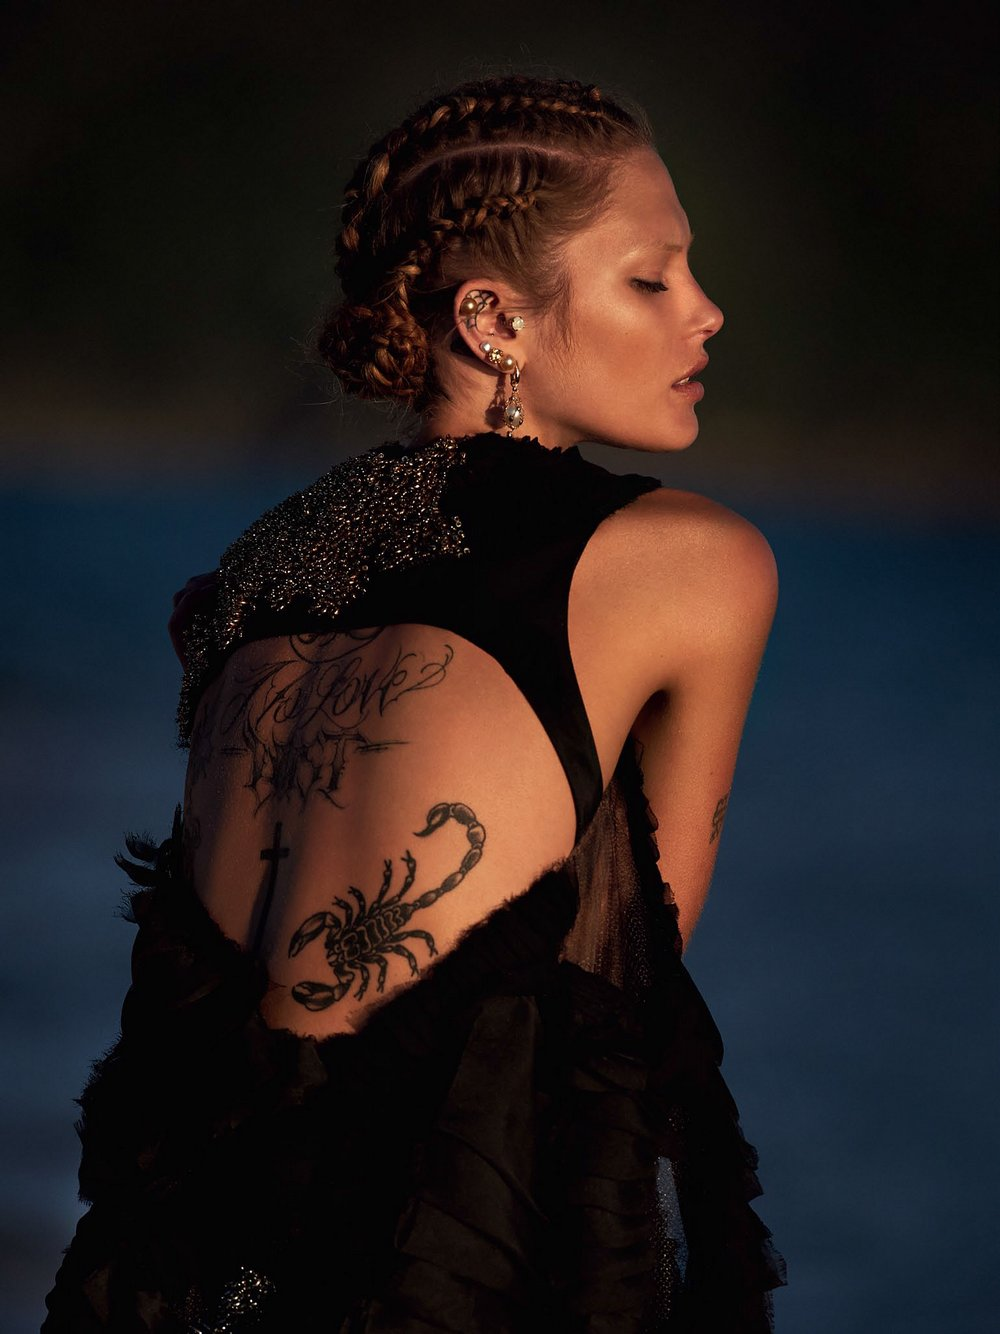 Catherine-McNeil-by-Gilles-Bensimon-for-Vogue-Australia-October-2014-6.jpg